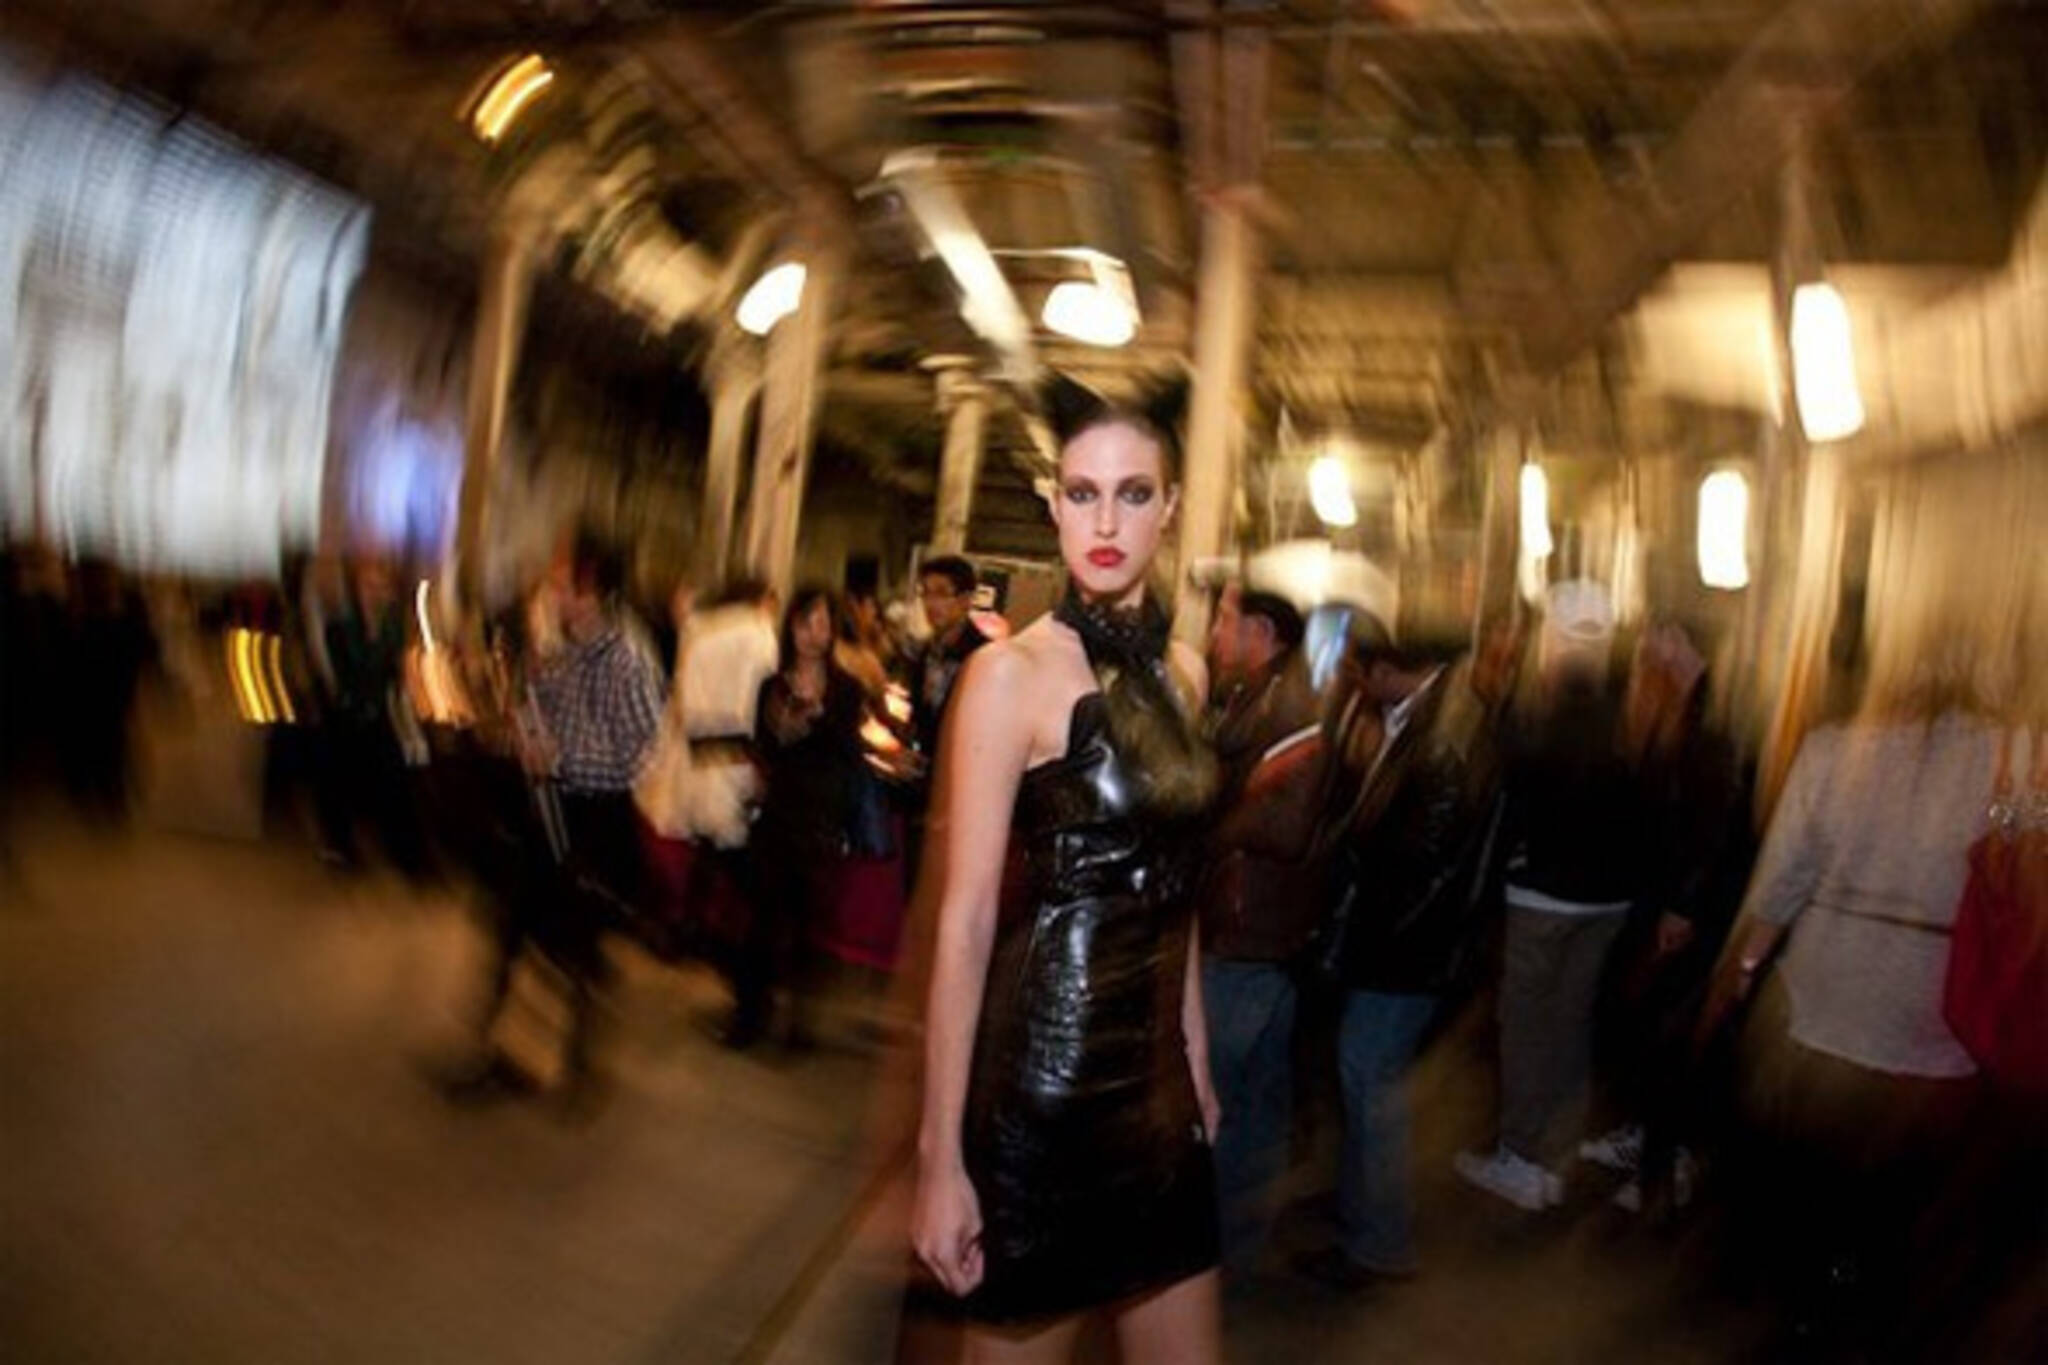 20091008-art-of-fashion-blur.jpg